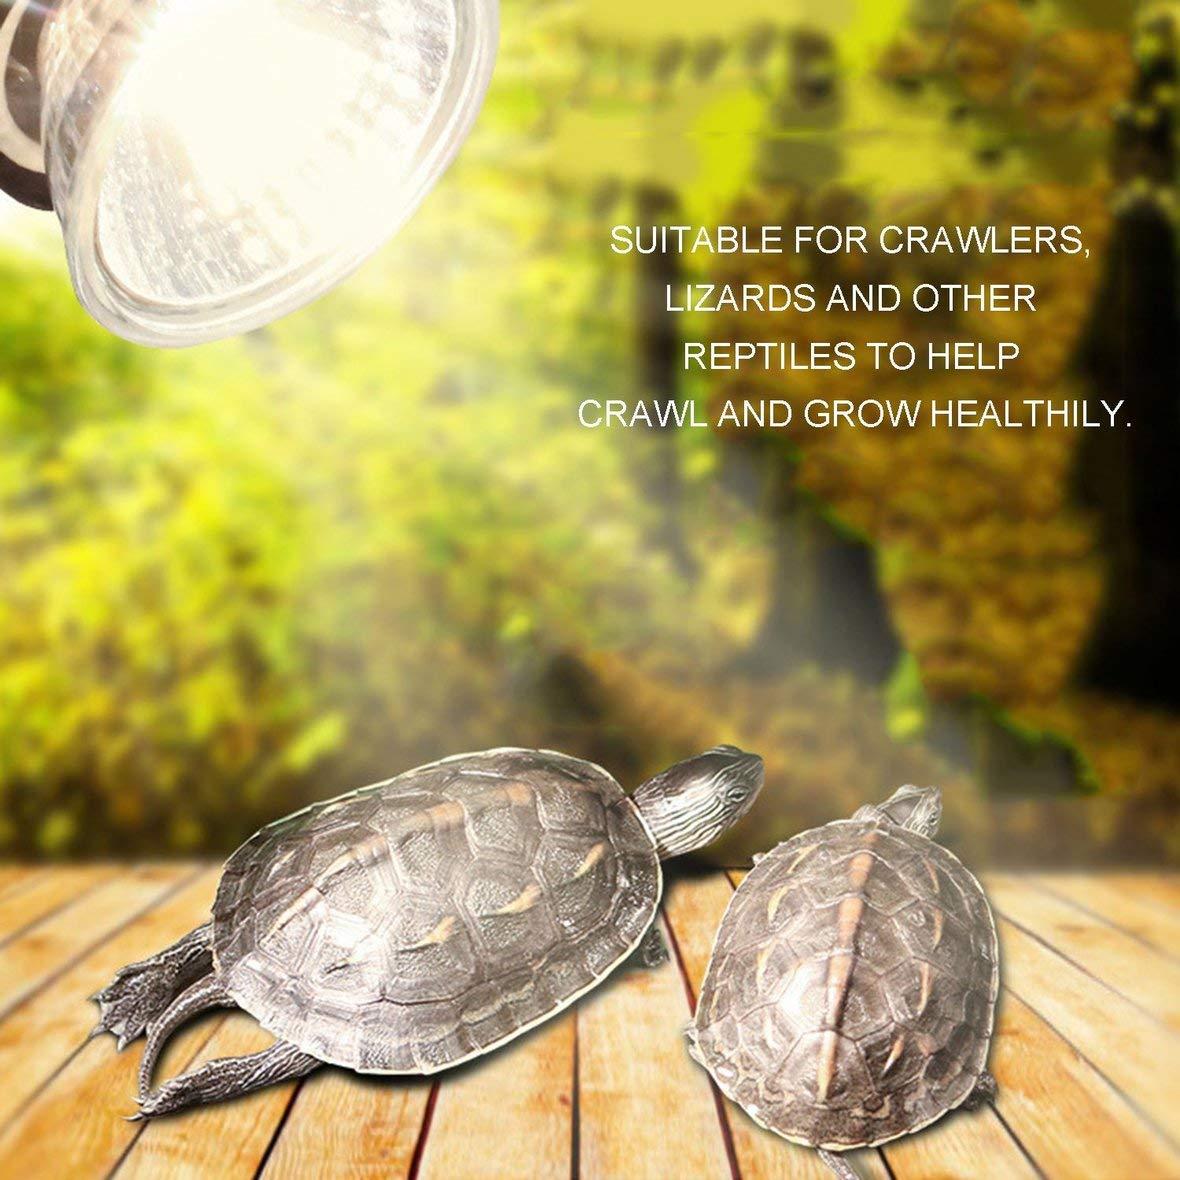 Tivolii Reptile Pet Sun Lamp Reptile Basking Spot Climb Pet Lamp Full Spectrum UVA UVB Turtle Tuff Splashproof Halogen Lamp Tortoise Heating Sun Lamp